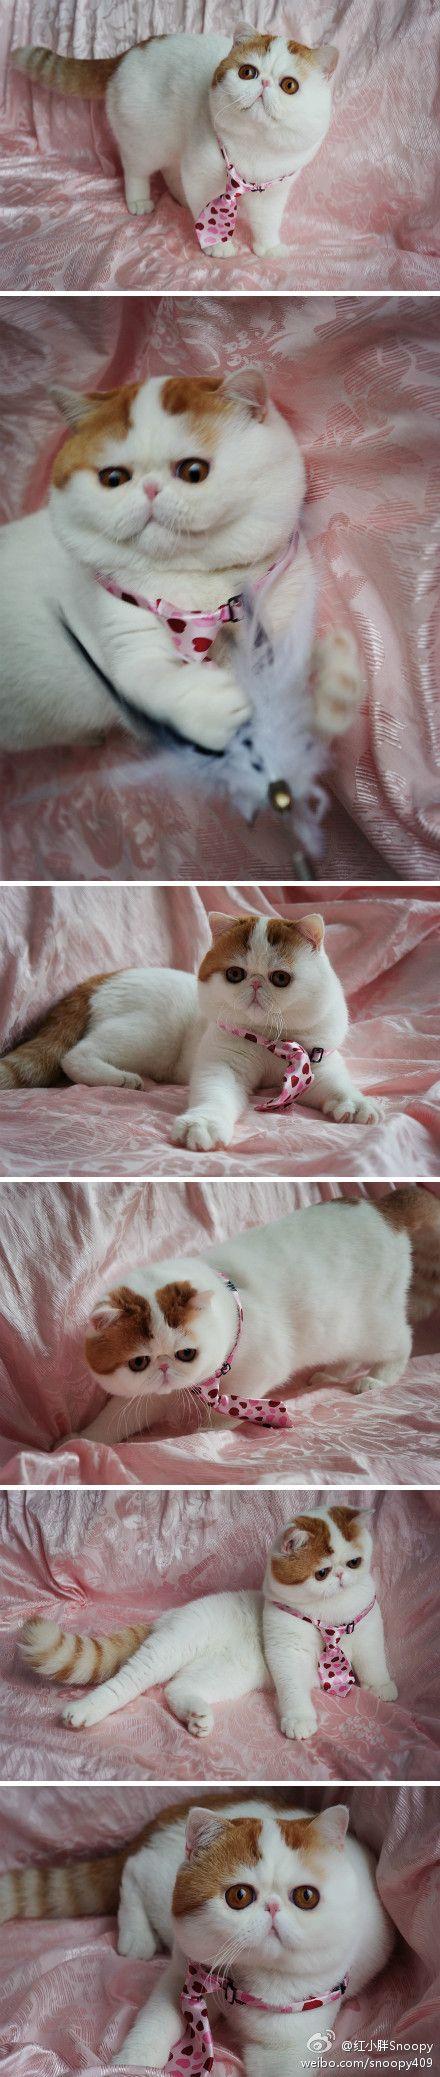 Internet cat Snoopy wearing a tie: Internet Cat, Favo Cat, Cat Pics, Adorable Cat, Exotic Cat, Rain Cat, Cat Snoopy, Eye